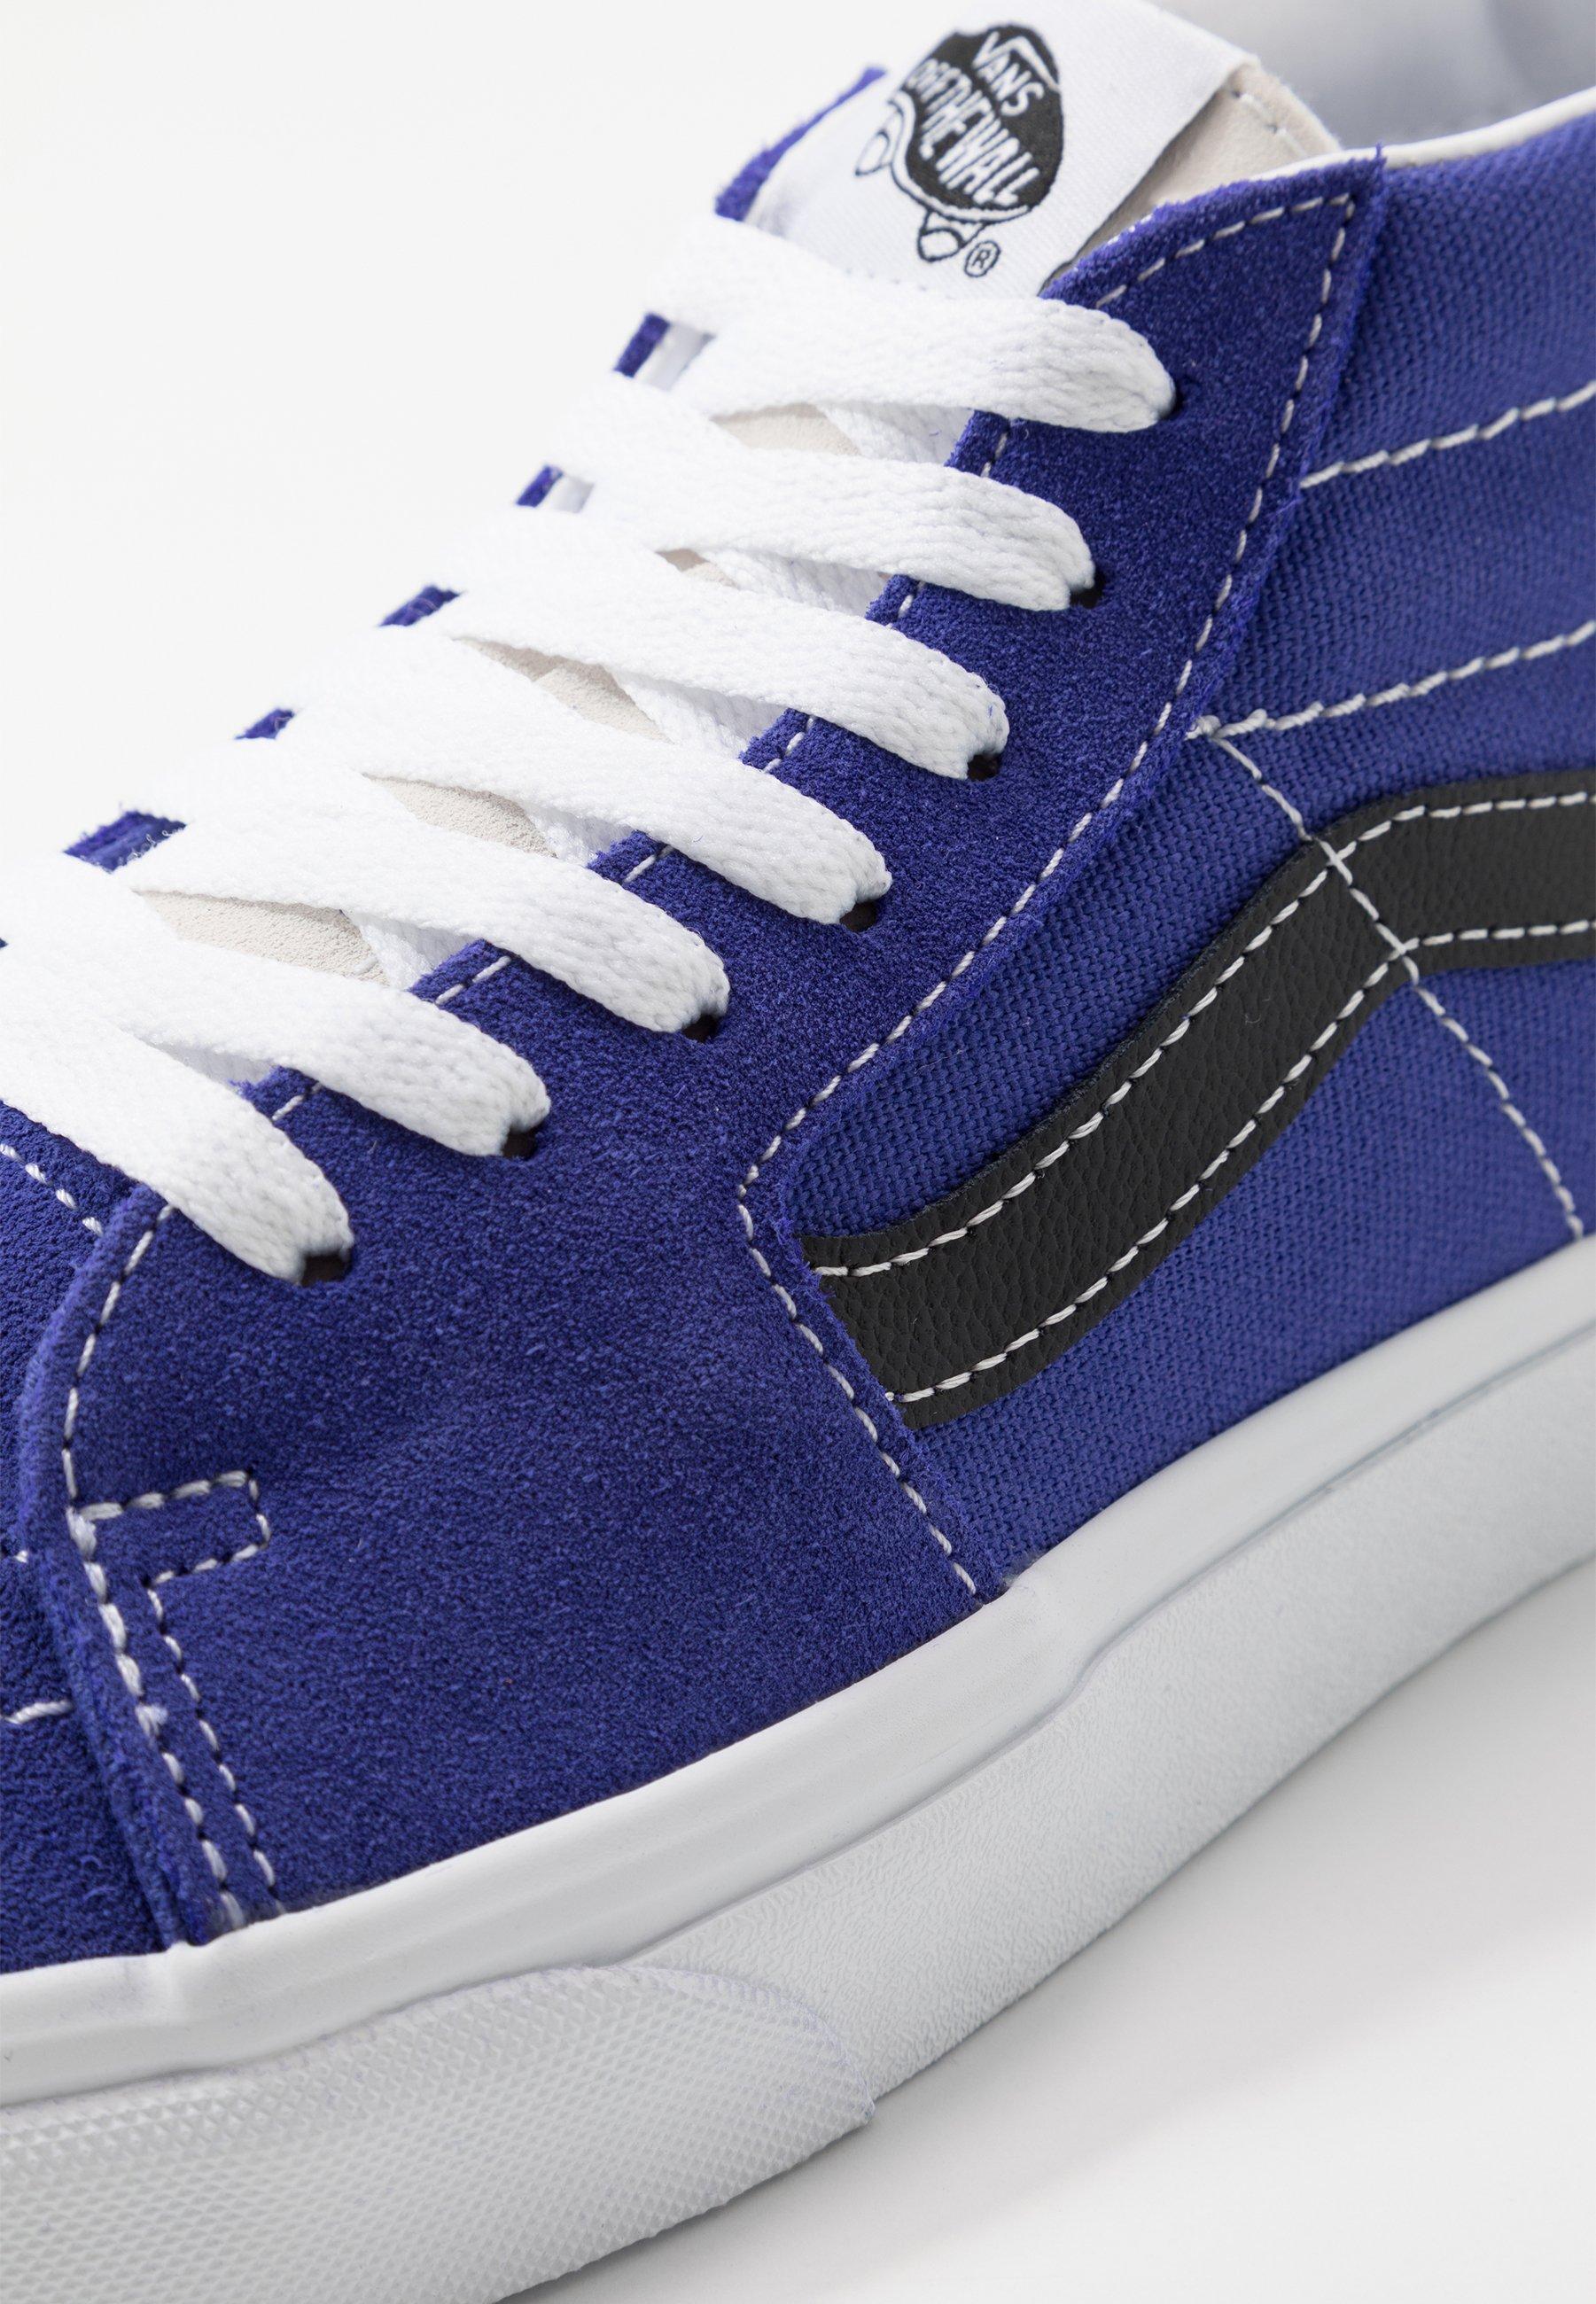 Vans SK8 MID - Baskets montantes - royal blue/true white - Sneakers femme Grande vente